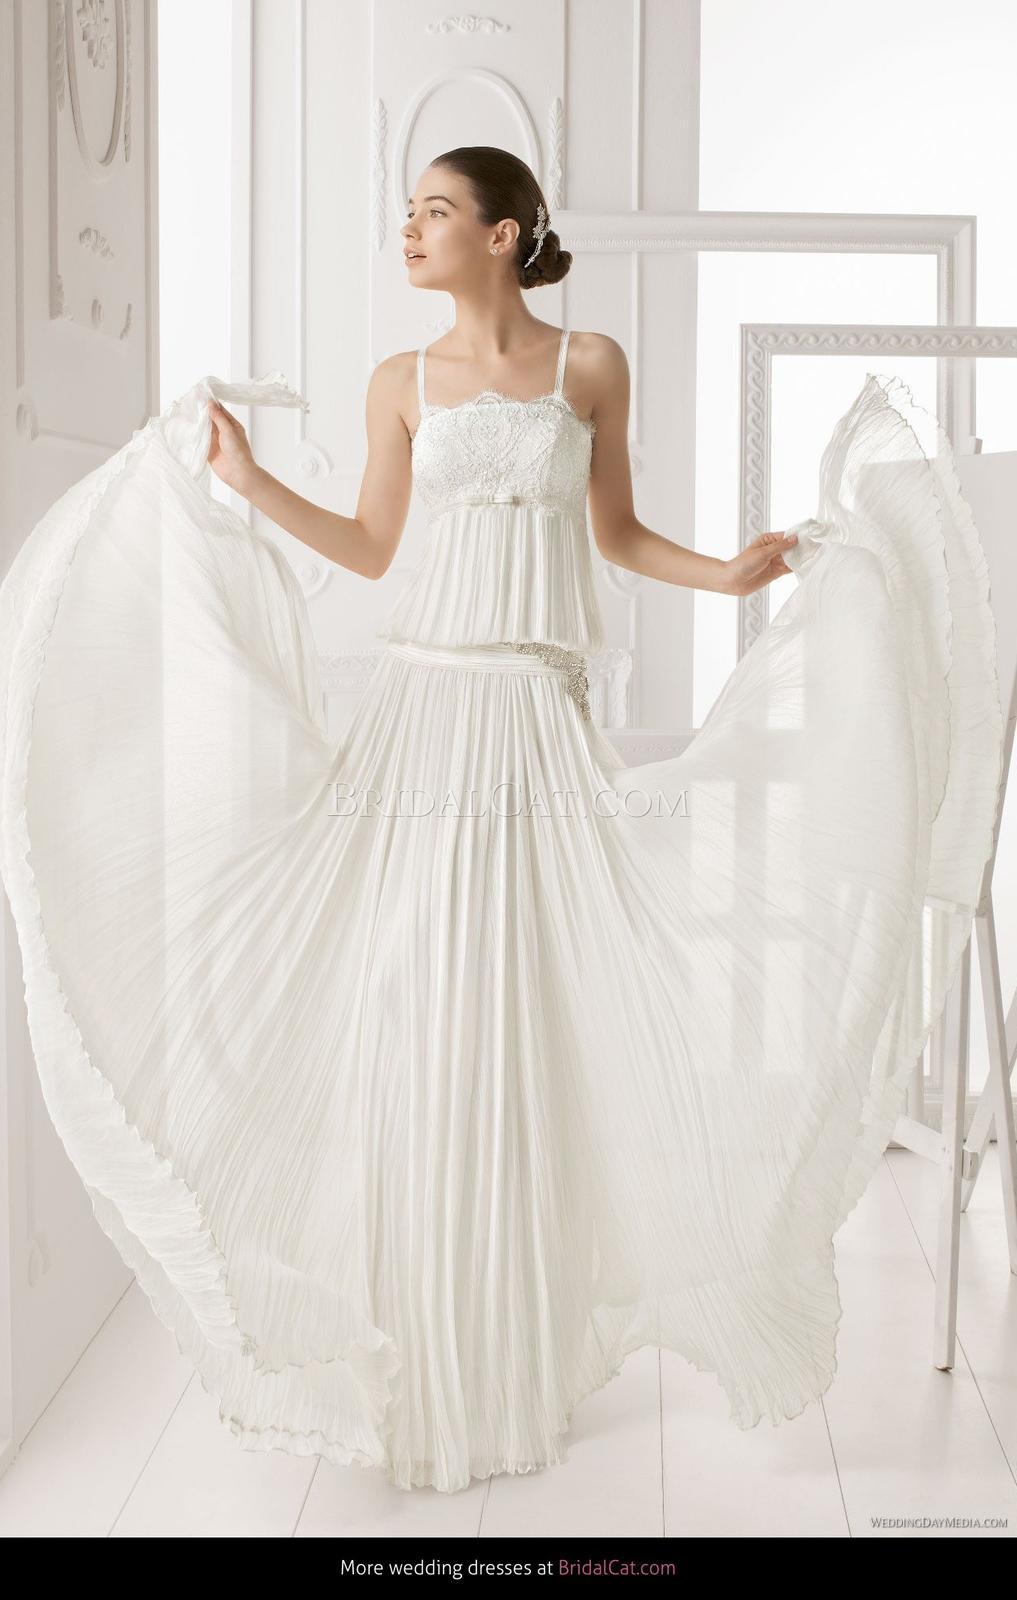 Svadobné šaty - AIRE BARCELONA - Obrázok č. 1